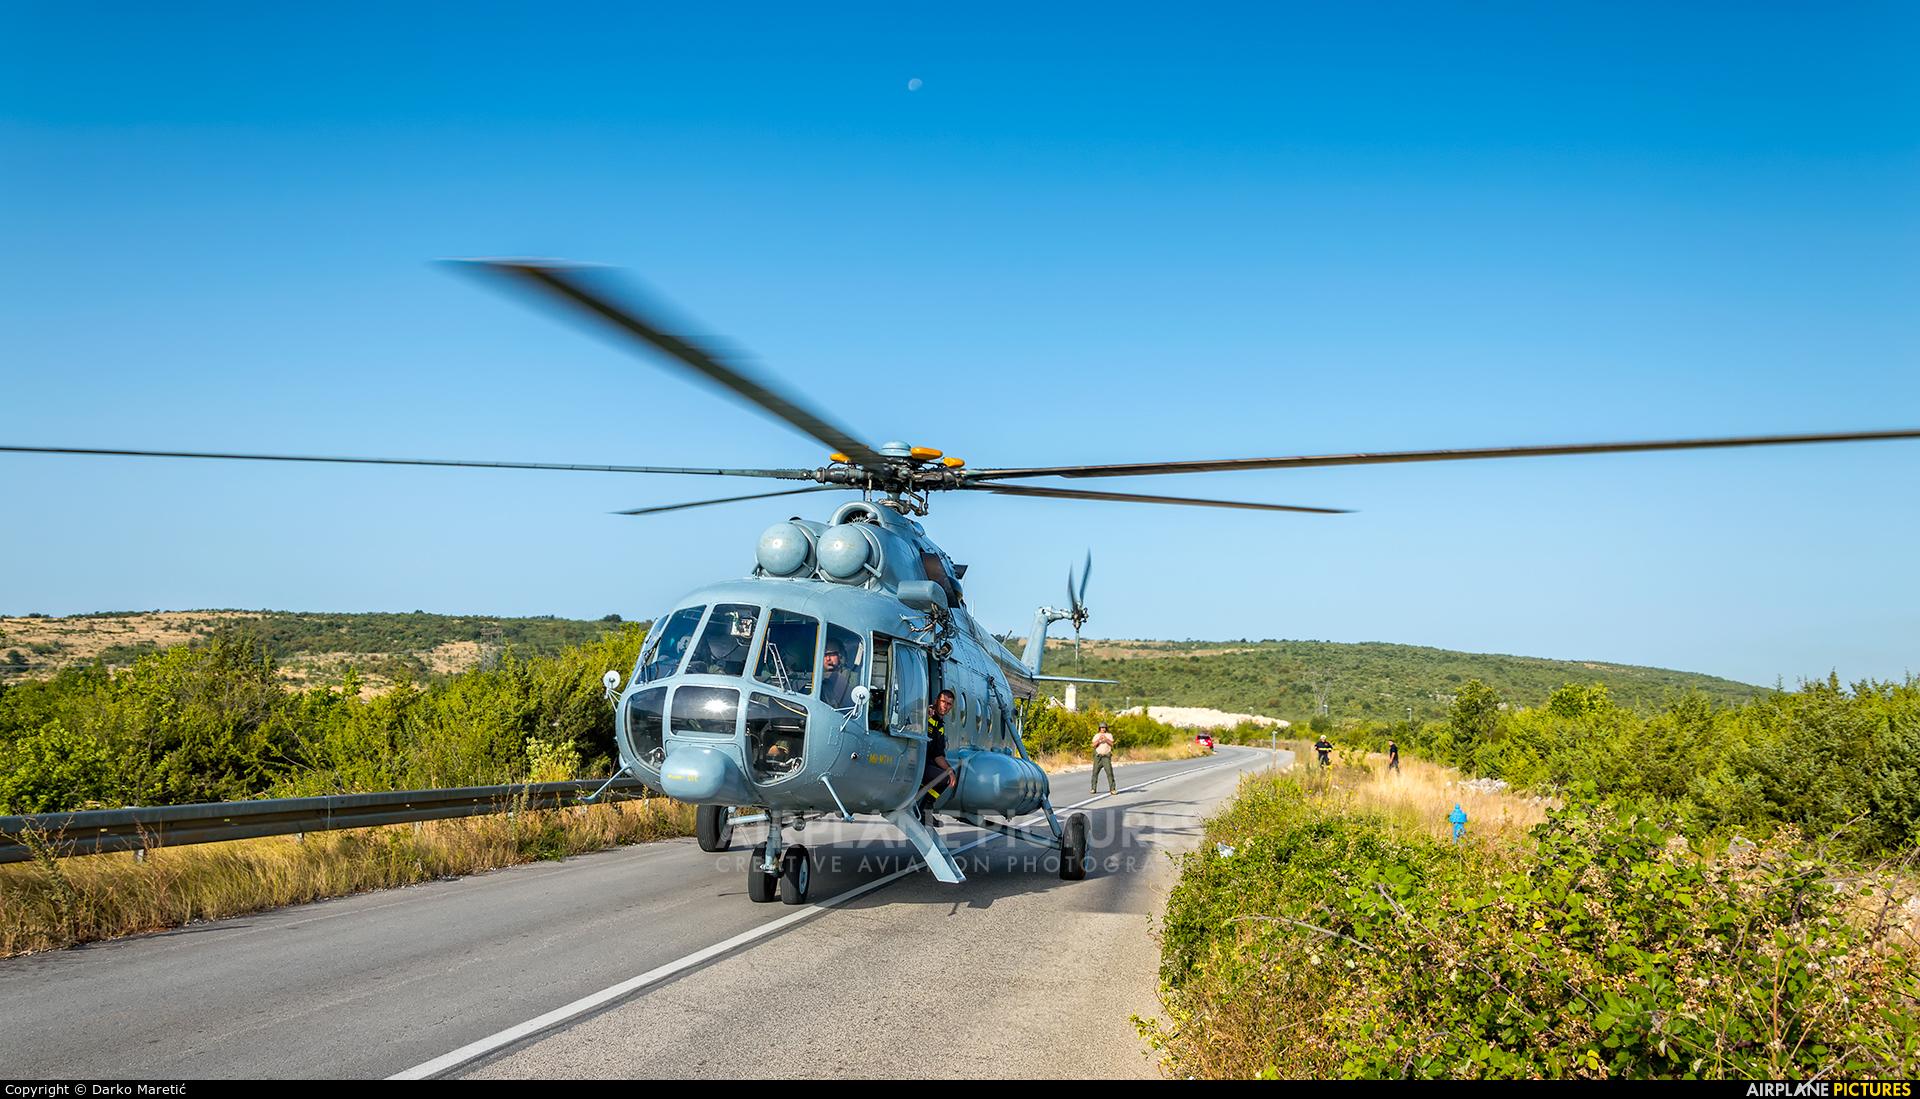 Croatia - Air Force 206 aircraft at Off Airport - Croatia